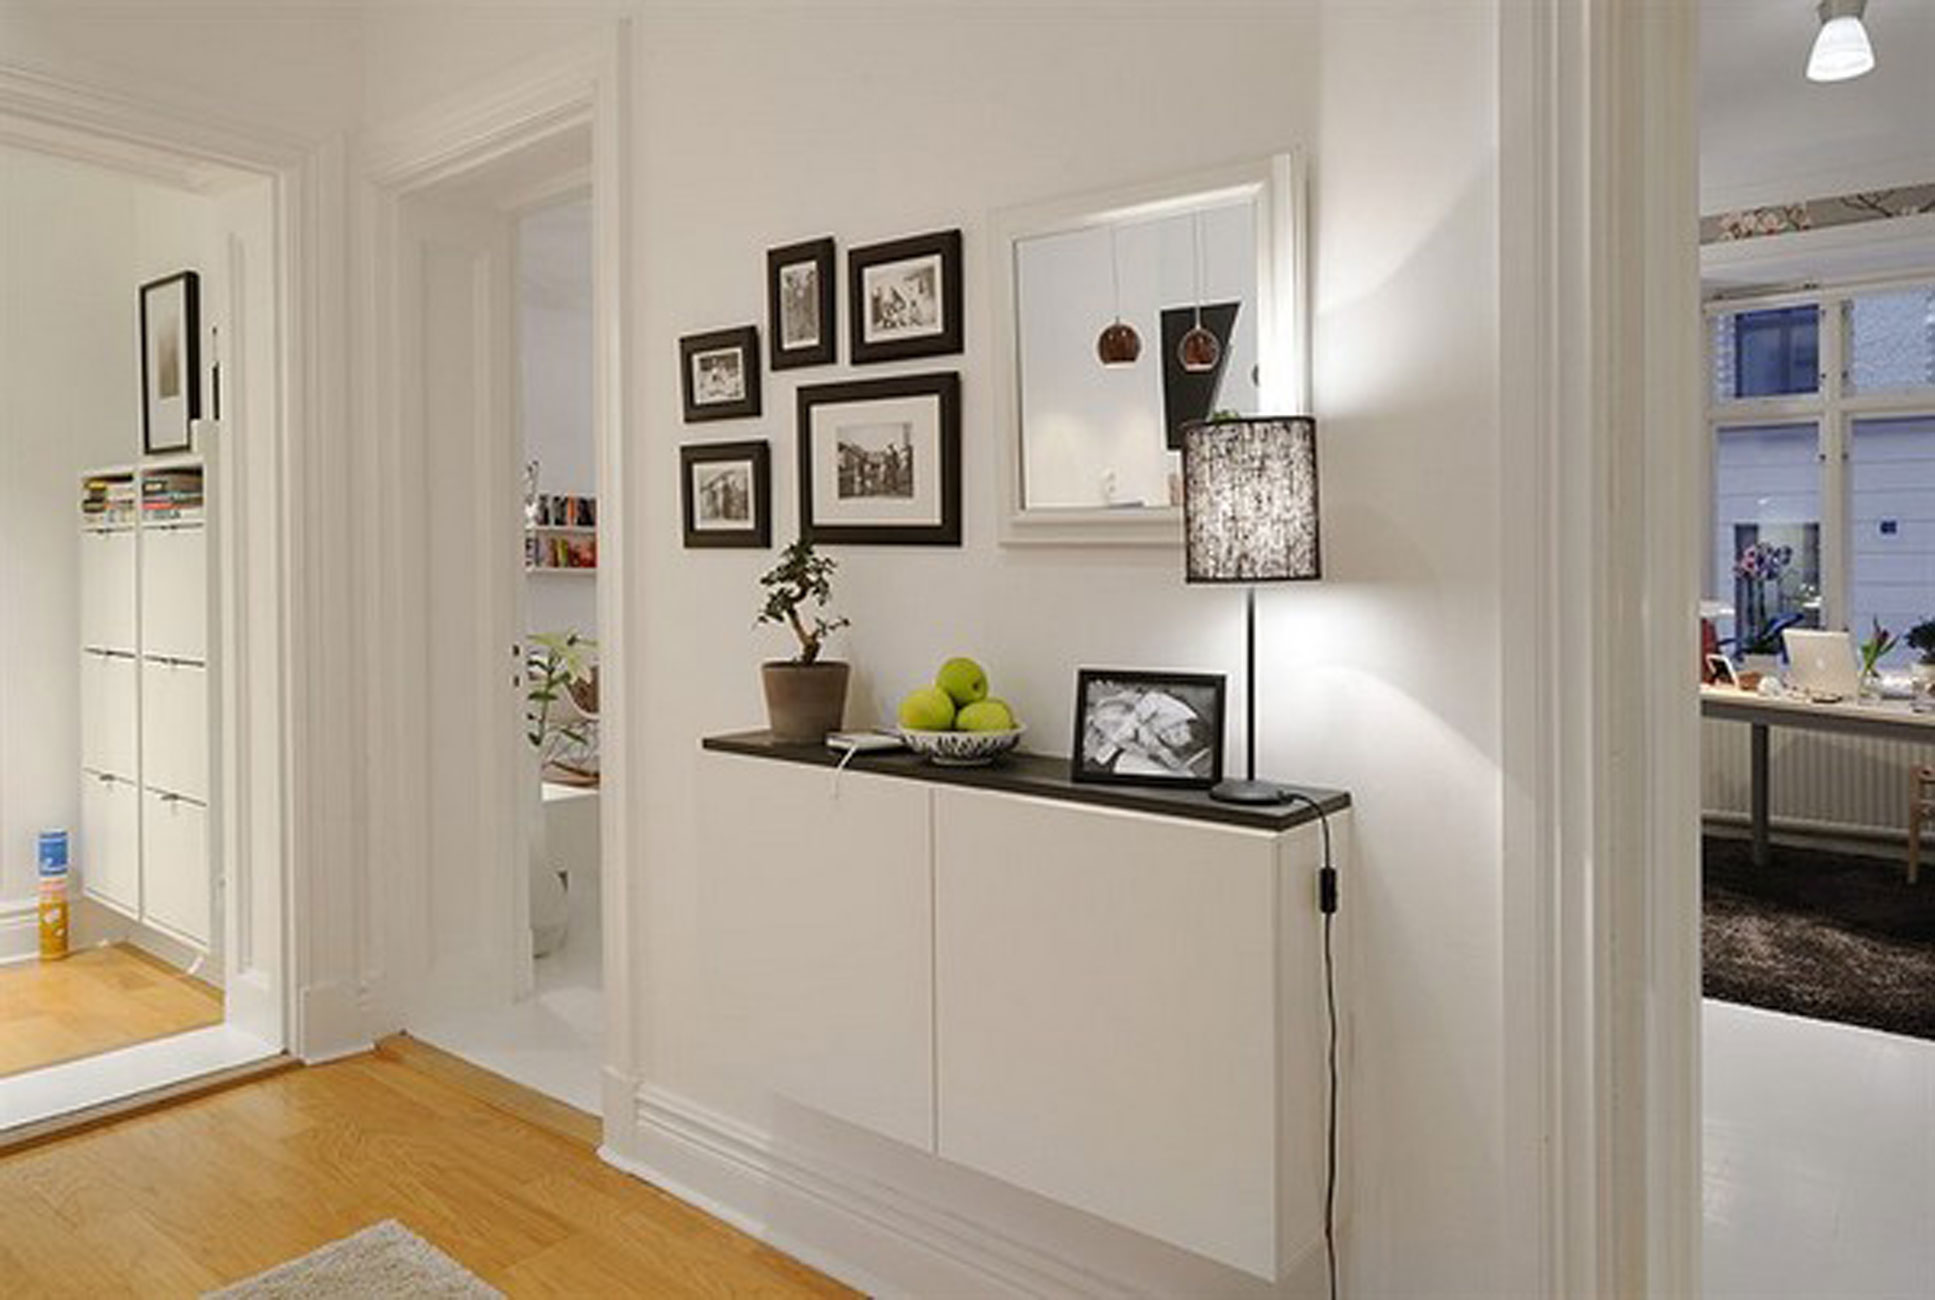 apartment-winsome-art-apartment-lisbon-art-for-the-apartment-art-apartment-therapy-art-apartment-taormina-artwork-for-small-apartment-art-for-small-apartment-art-for-studio-apartment-art-apartm